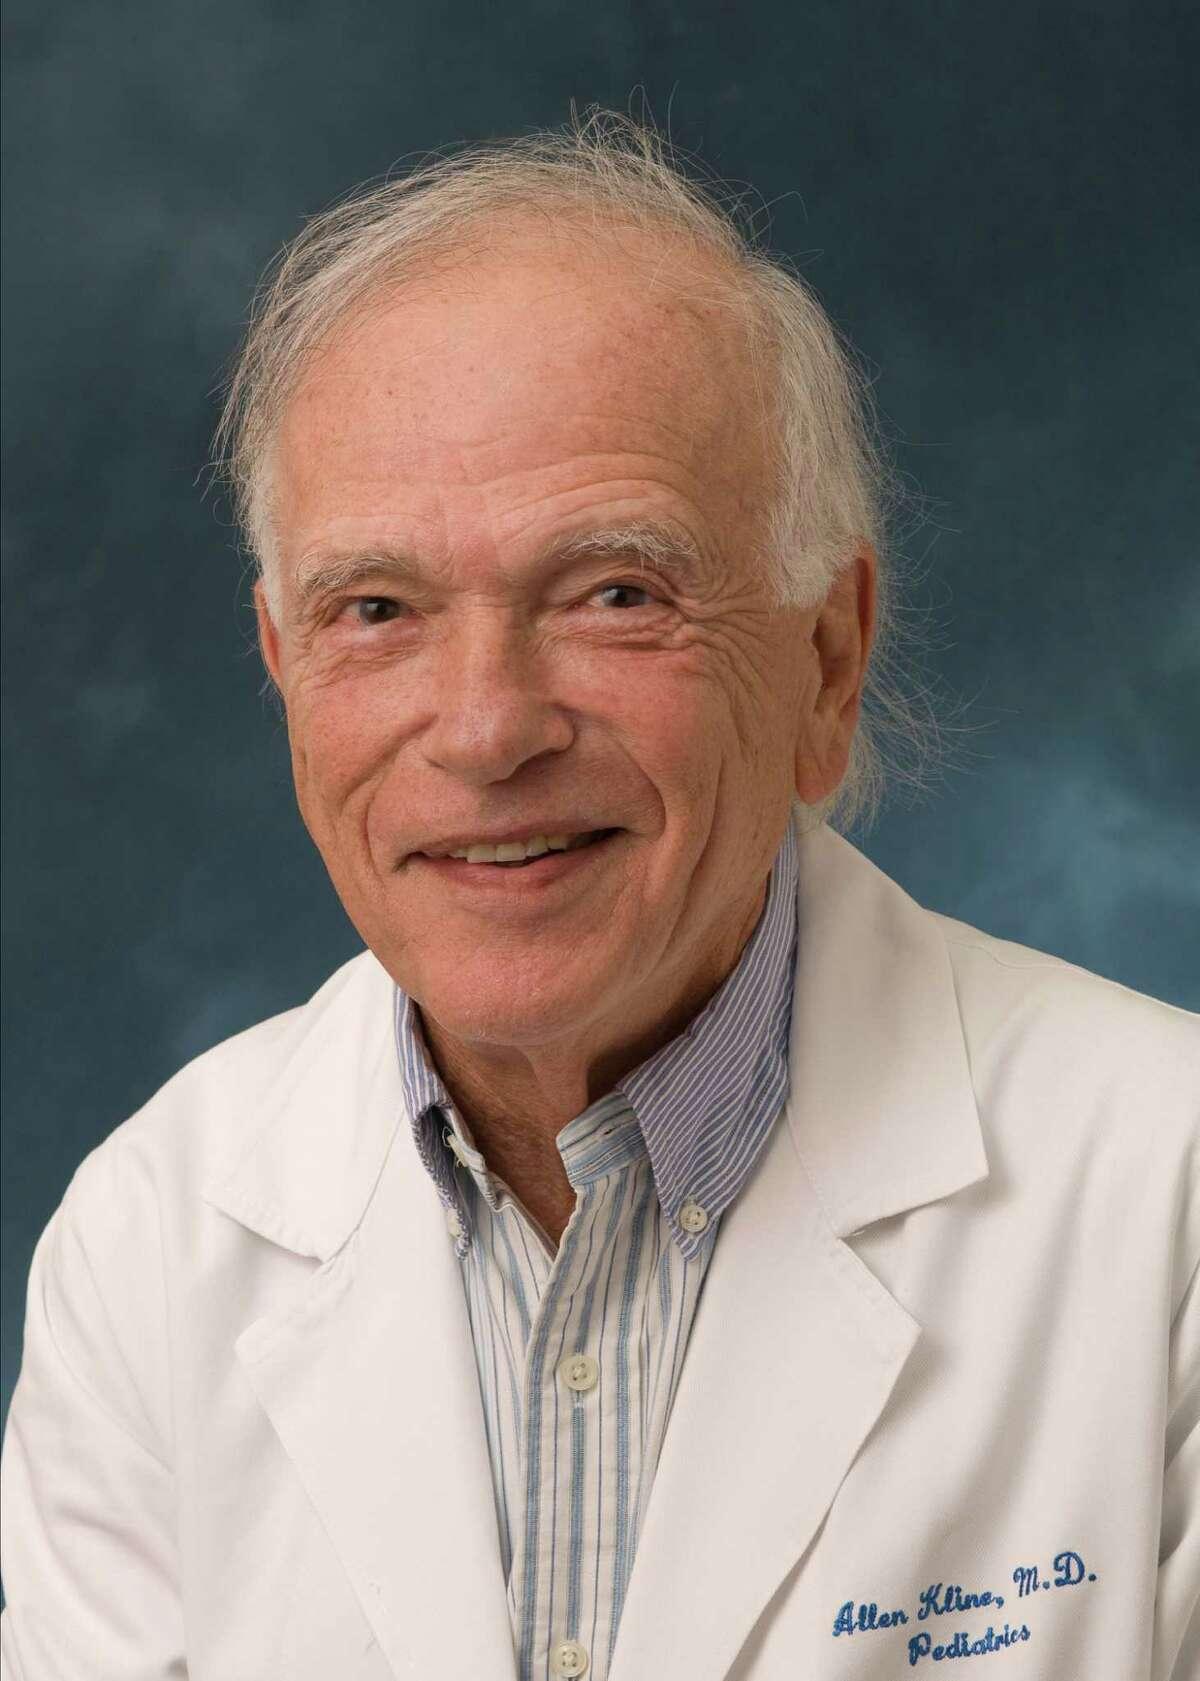 Dr. Allen Kline of Texas Children's Hospital.